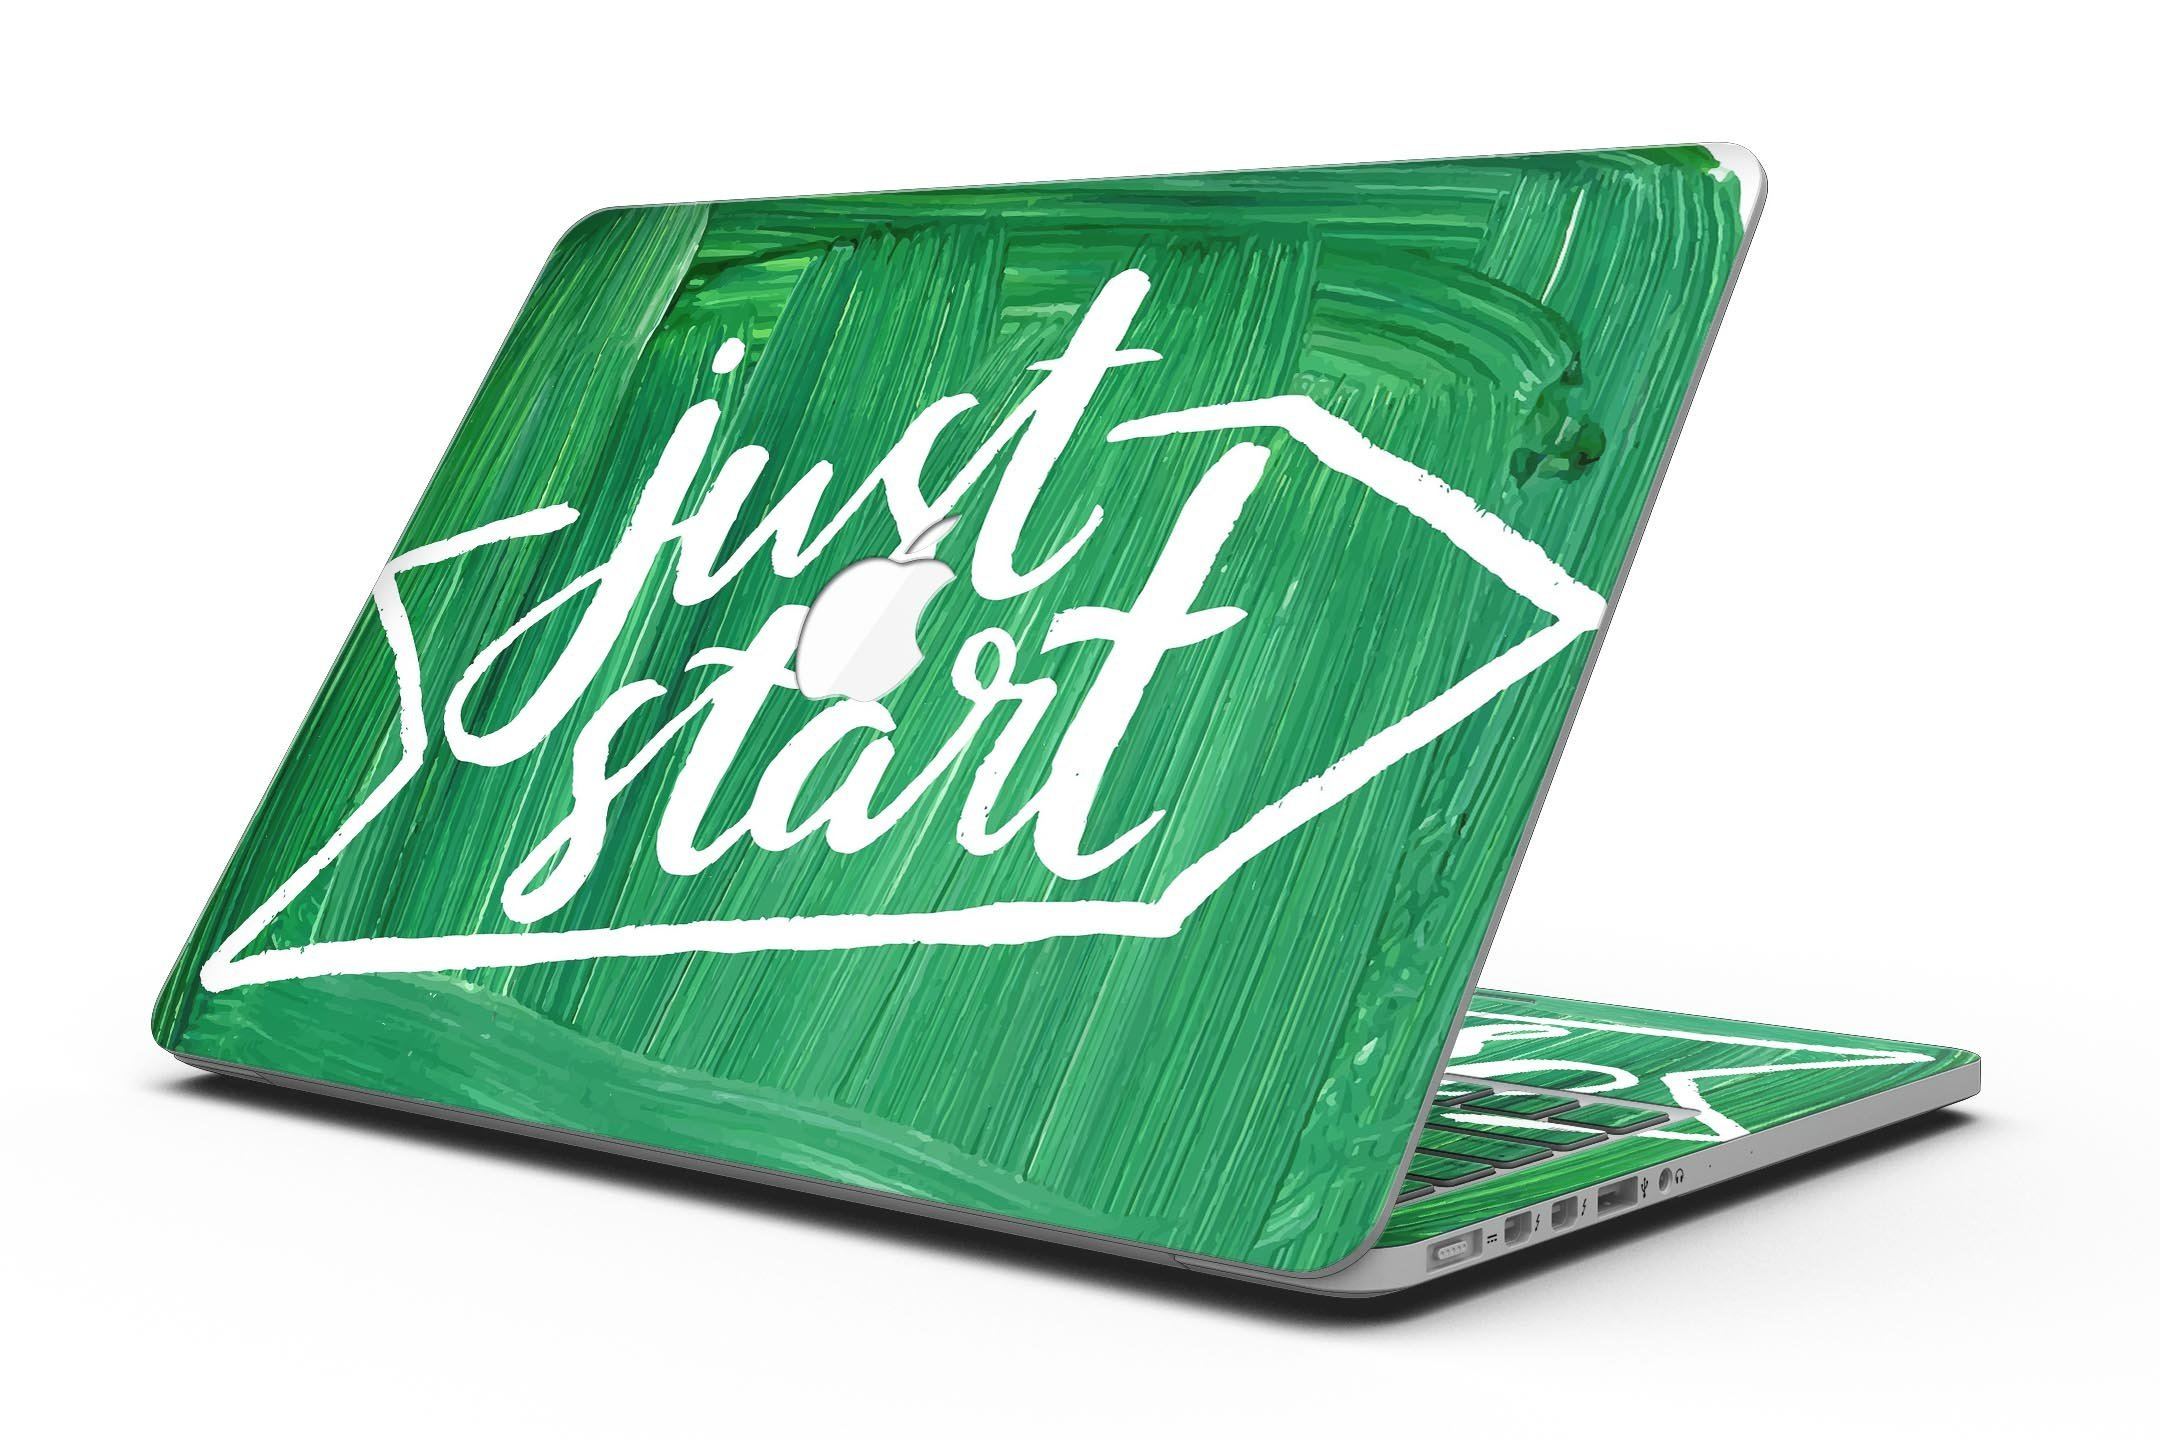 Just Start Green Paint - MacBook Pro with Retina Display Full-Coverage Skin Kit